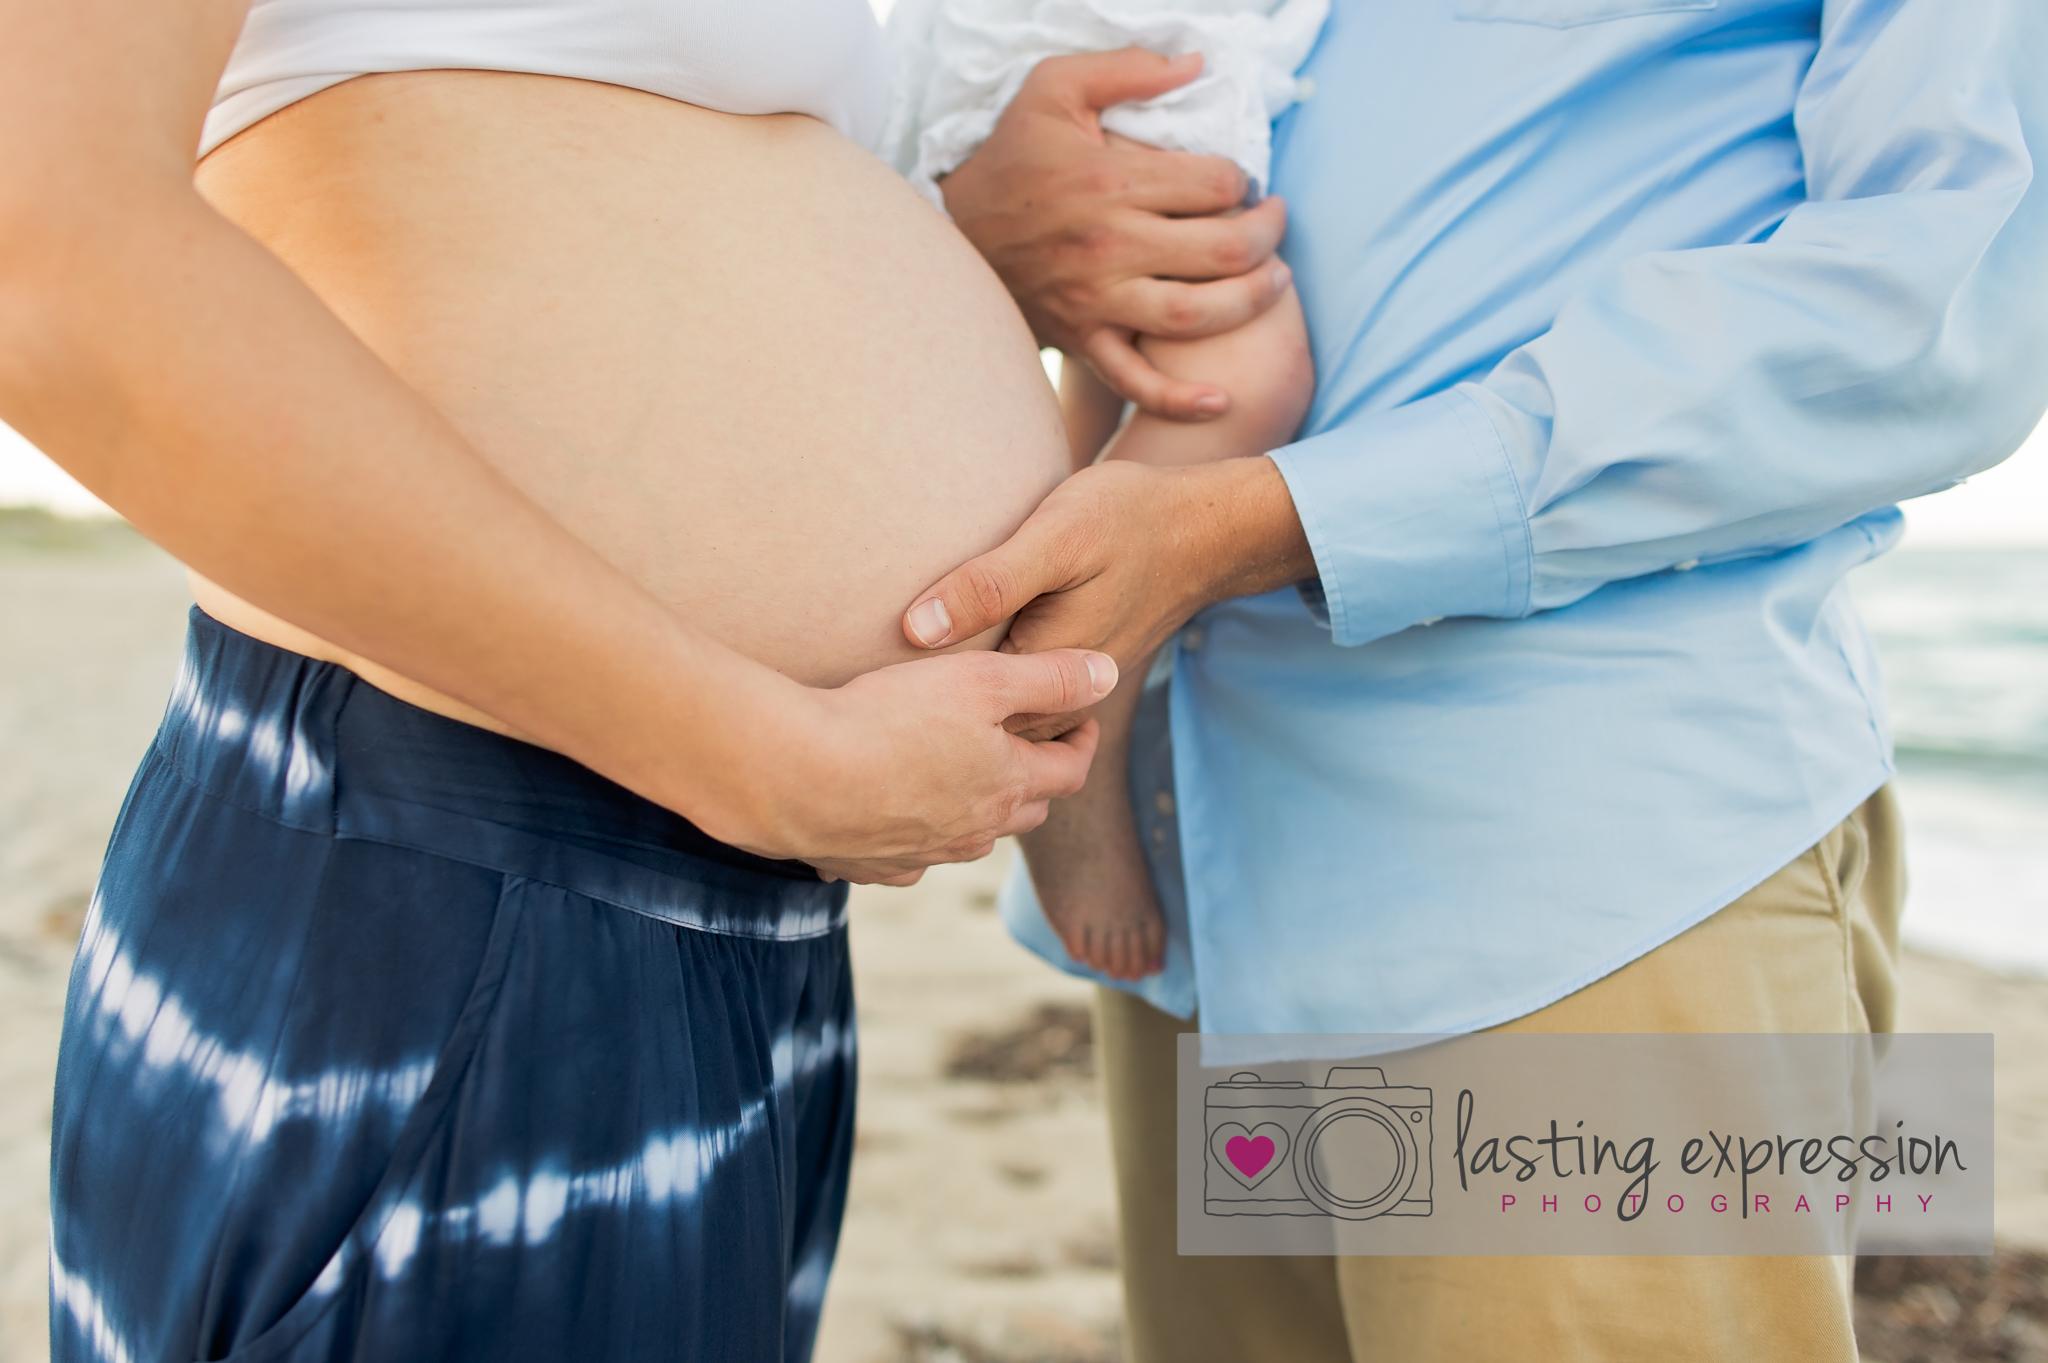 rivera-maternity-logo-8.jpg